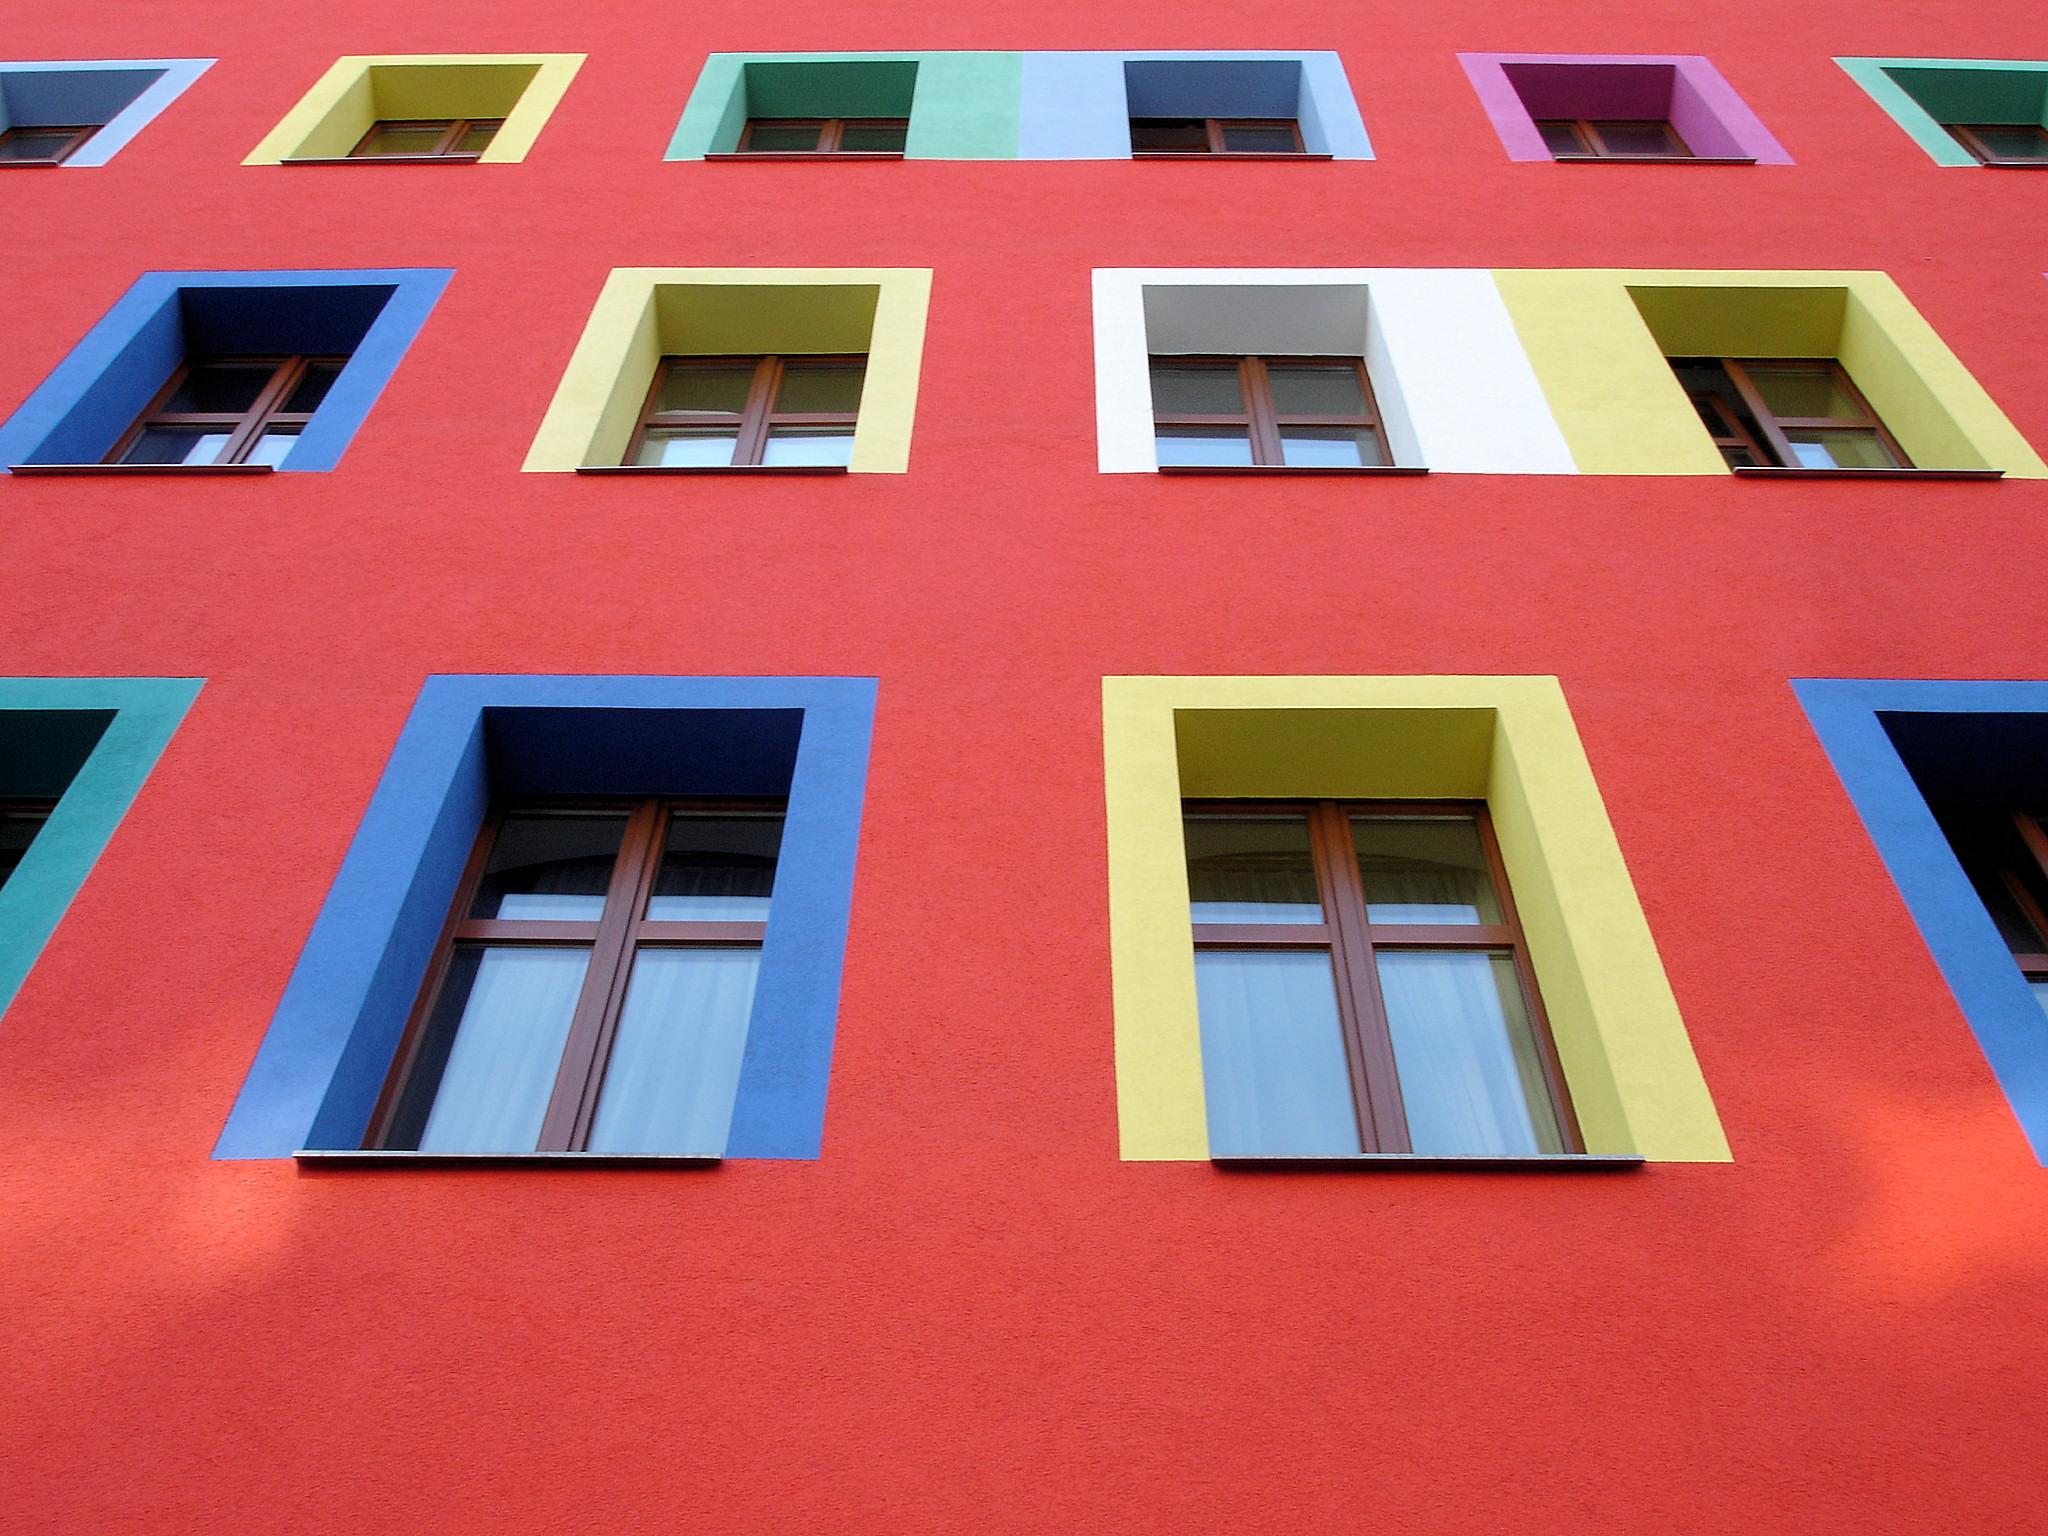 Zossener Strasse, Berlin